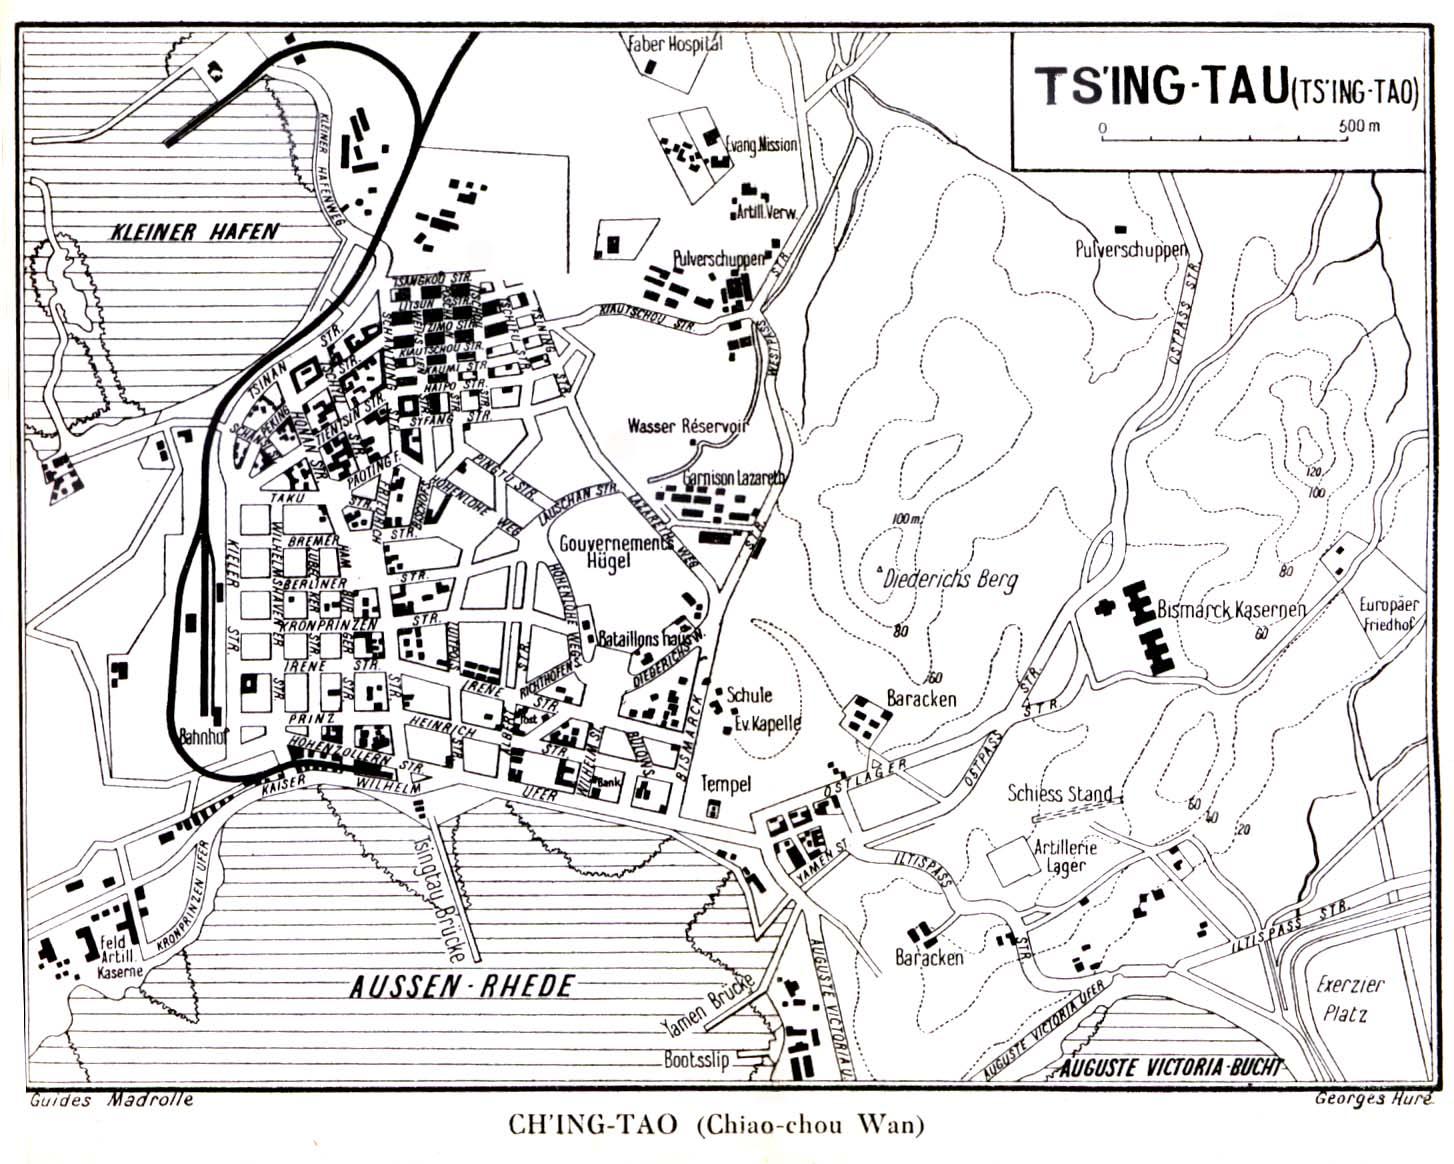 Batalla de Tsingtao Qingdao-city-map-1912-in-german-from-madrolles-guidebook-to-northern-china